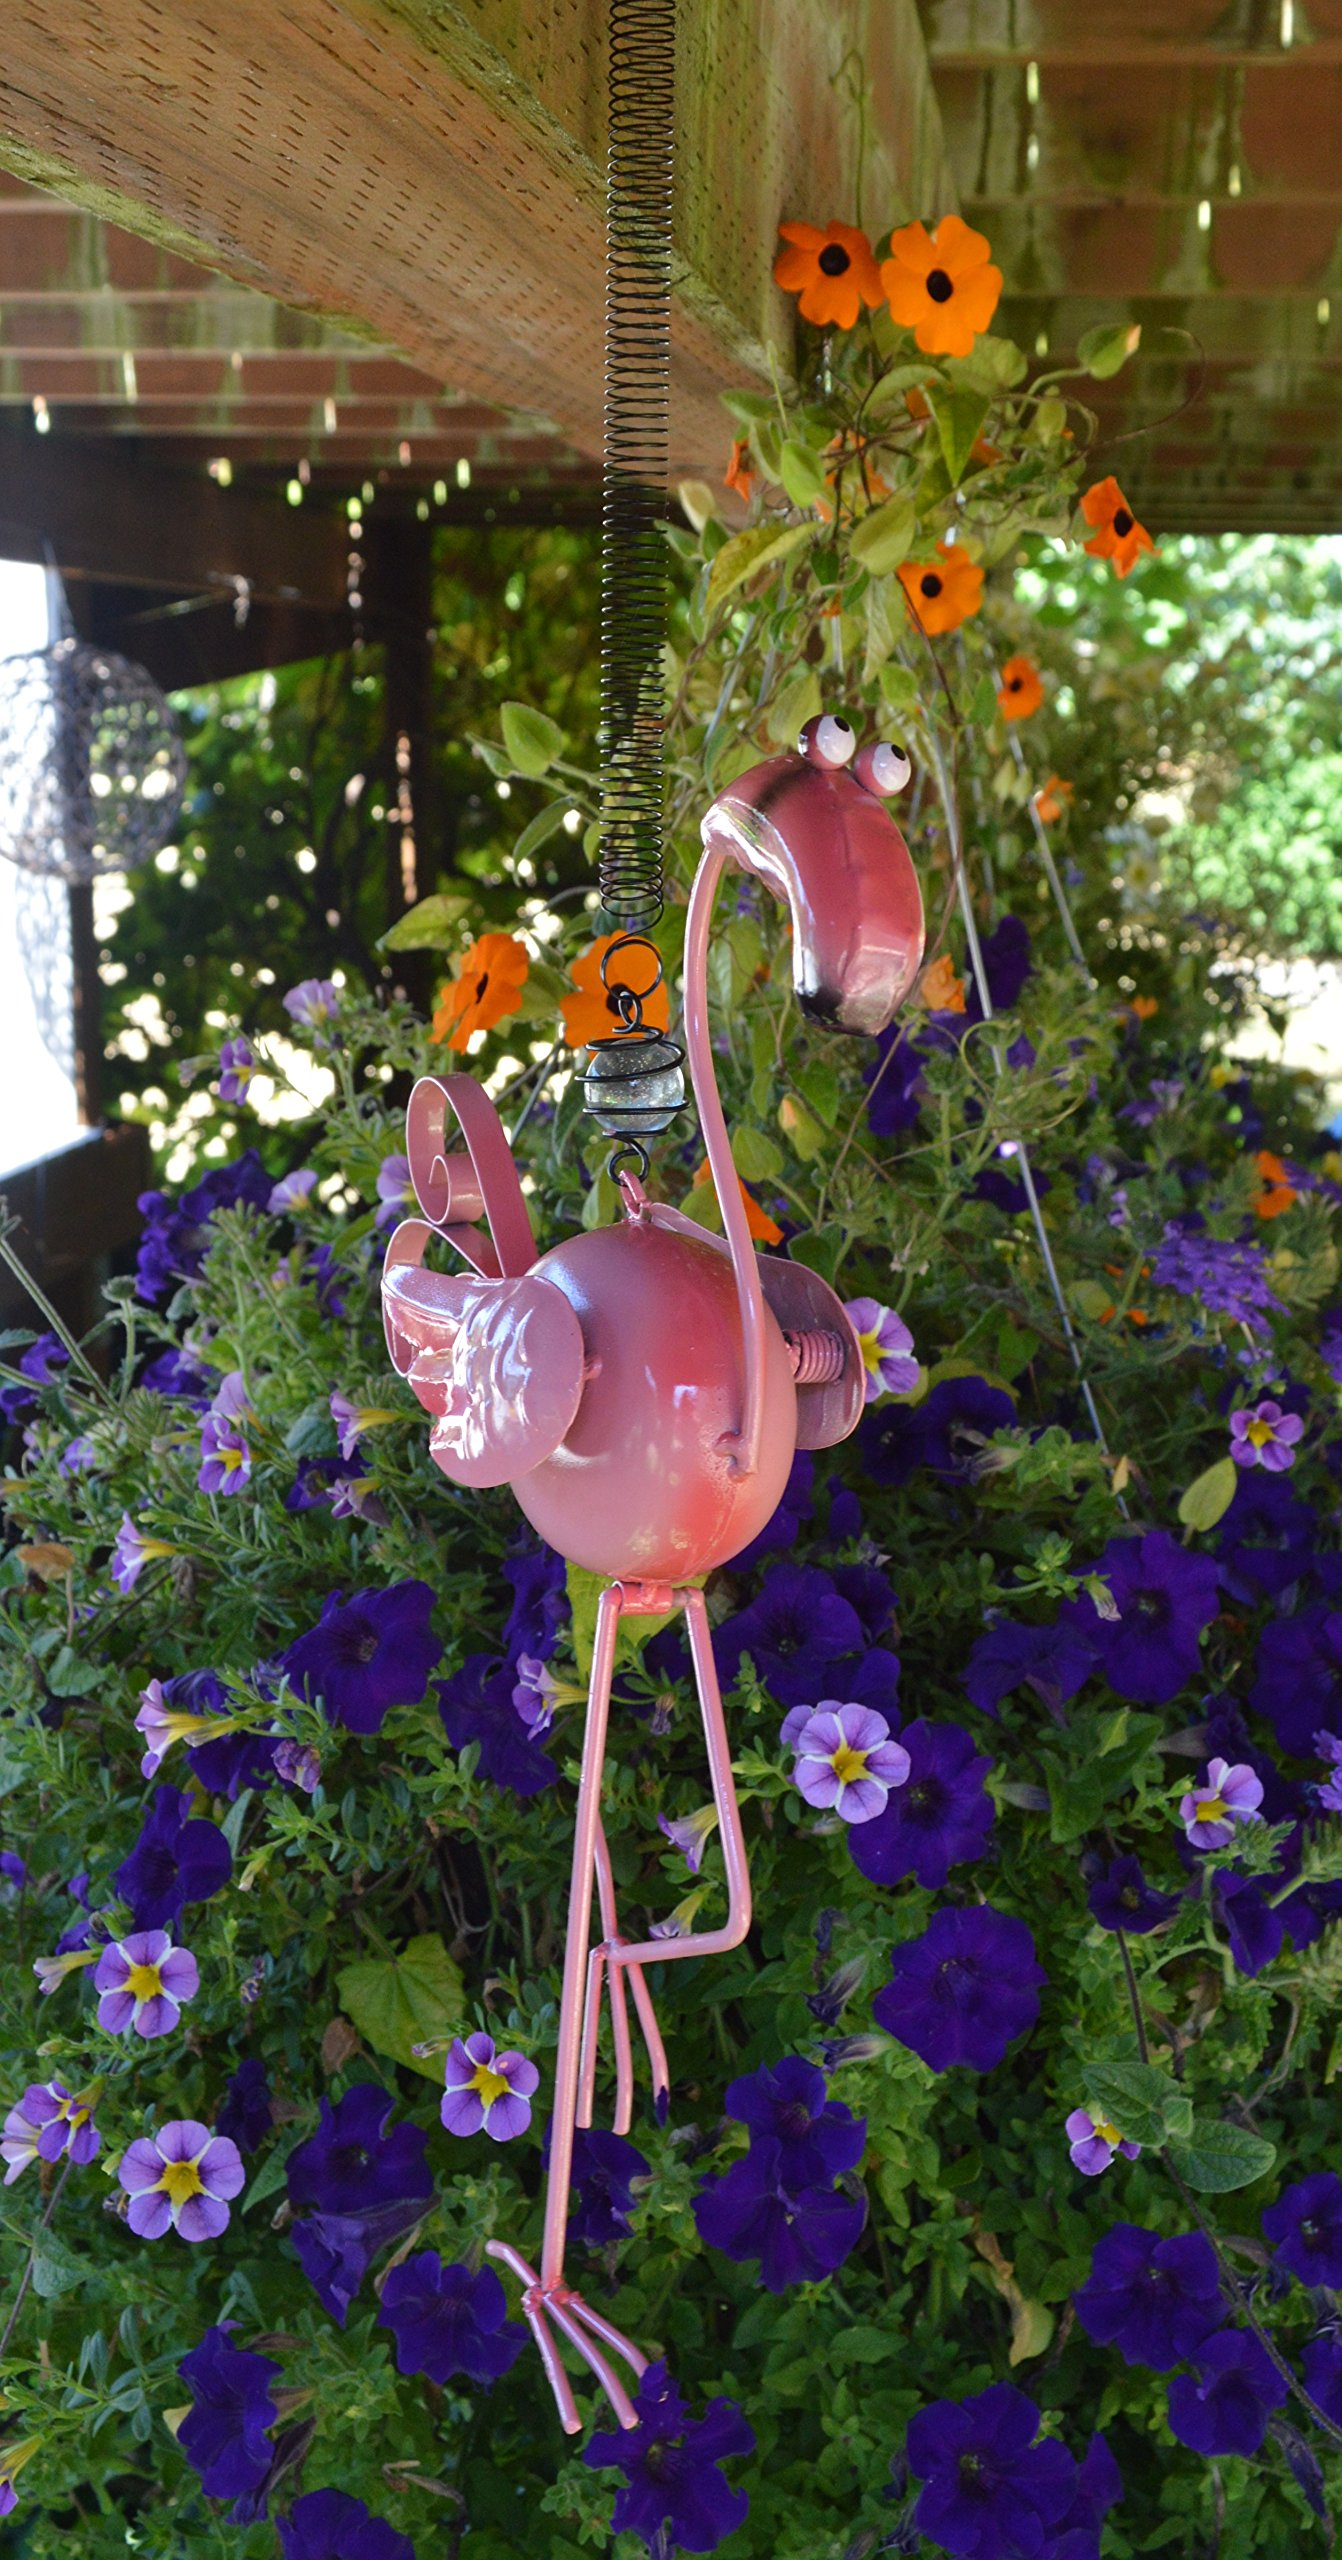 Sunset Vista Designs 91992 Bouncy Garden Decoration, 18'', Flamingo